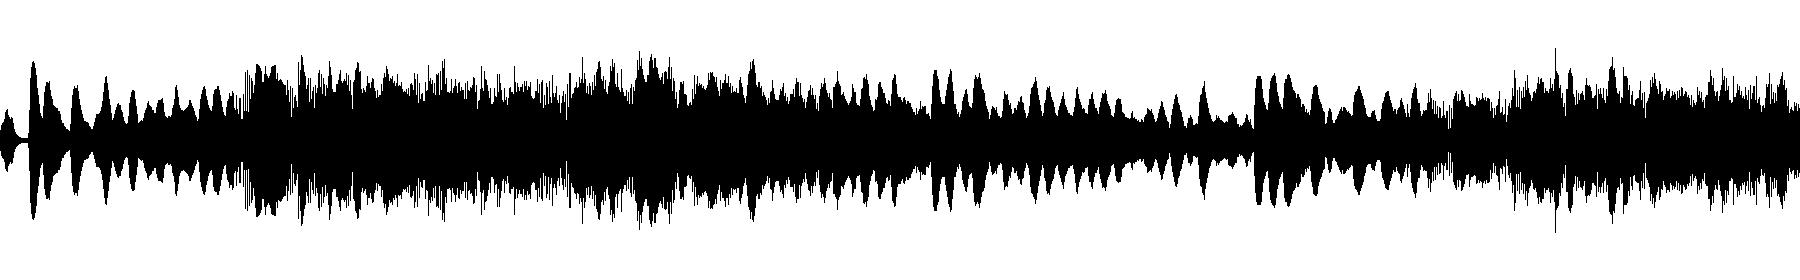 dp sequence apreg loop07